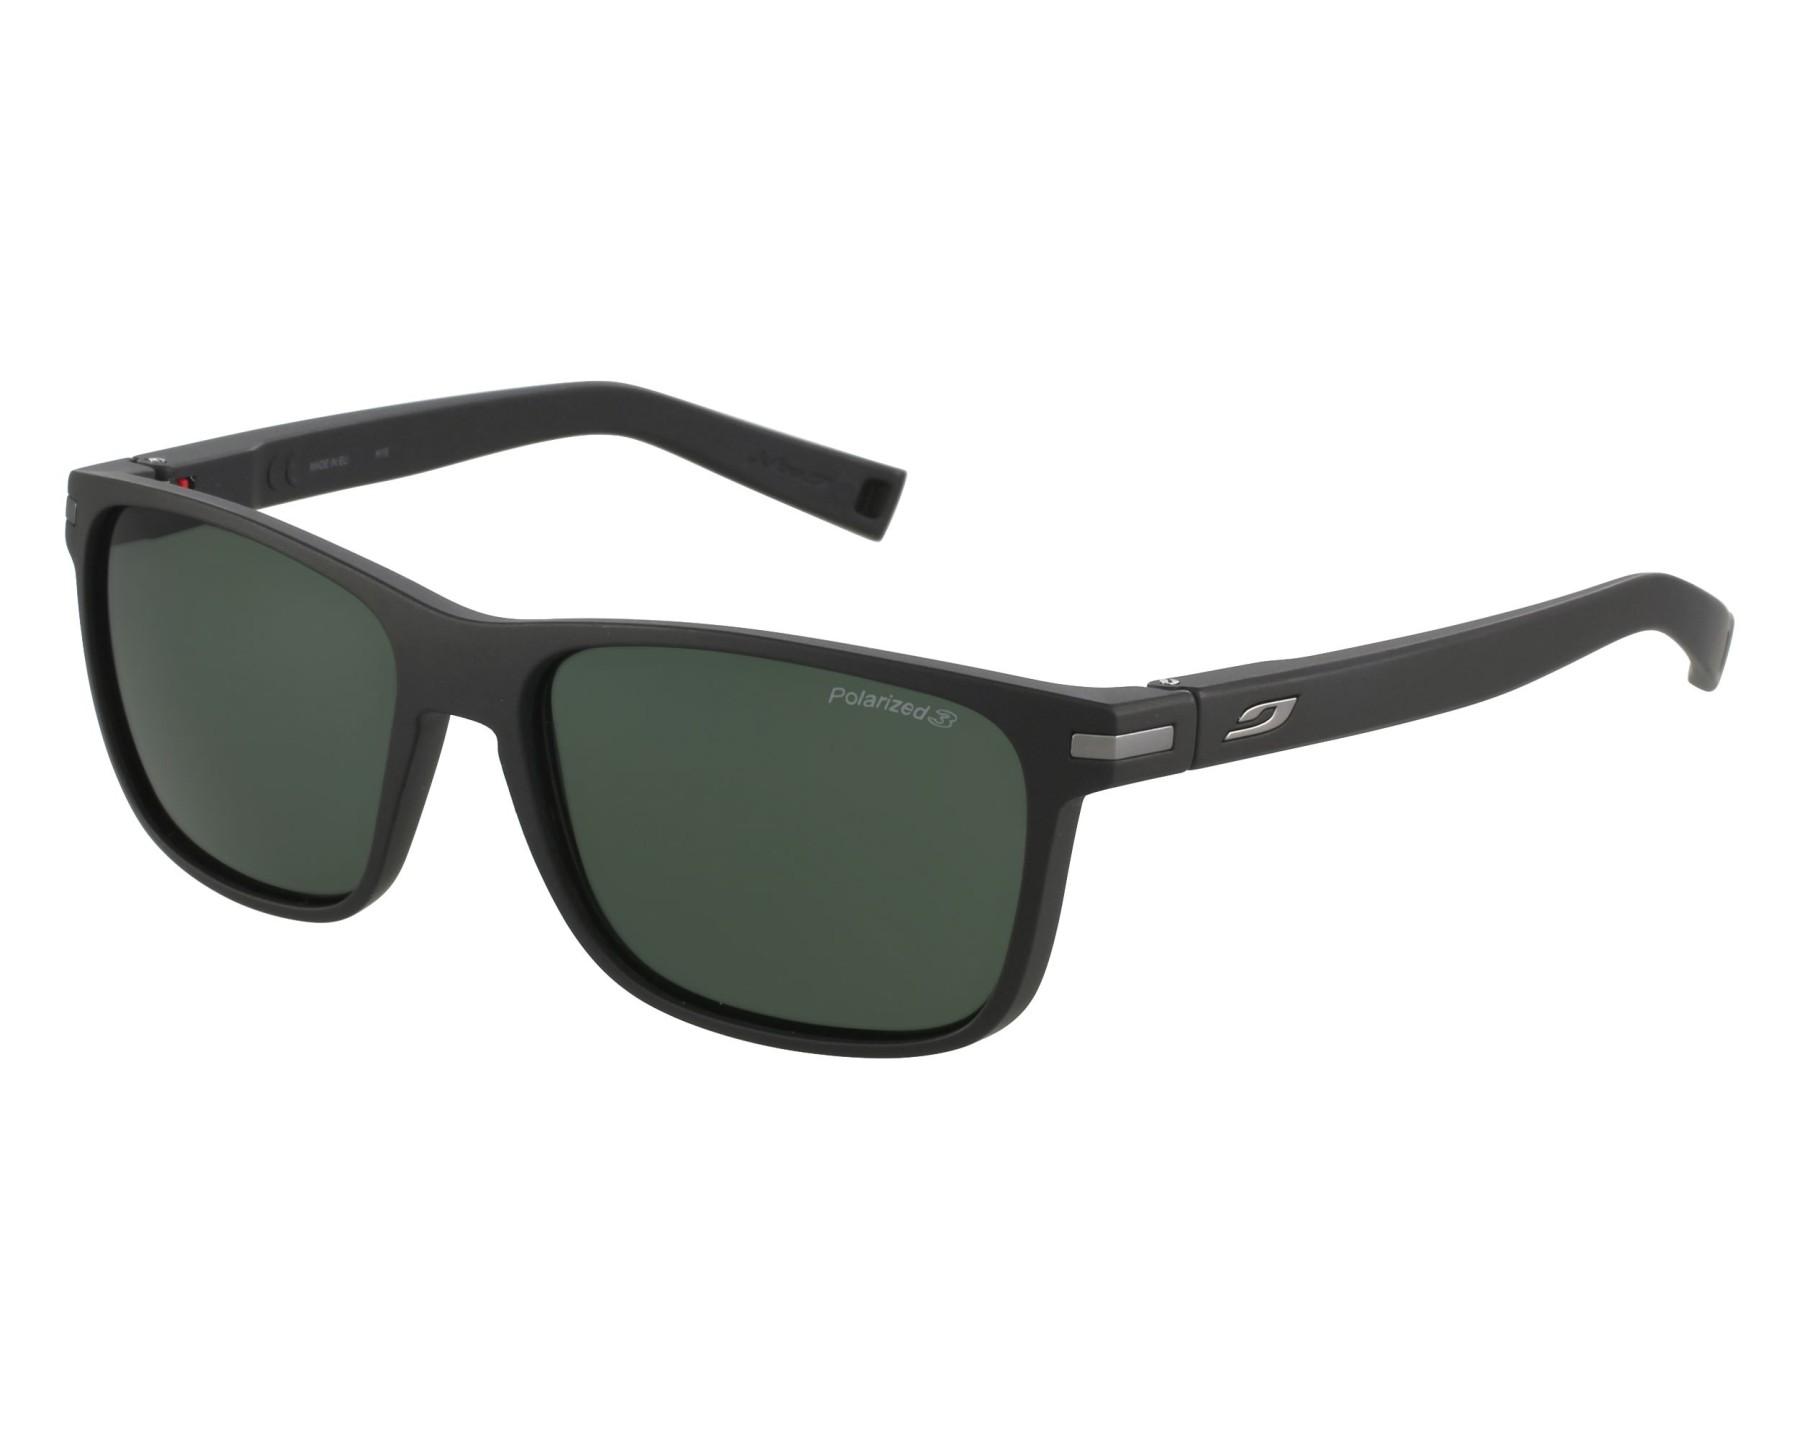 66a81d796d Sunglasses Julbo J481 9014 47-17 Black front view